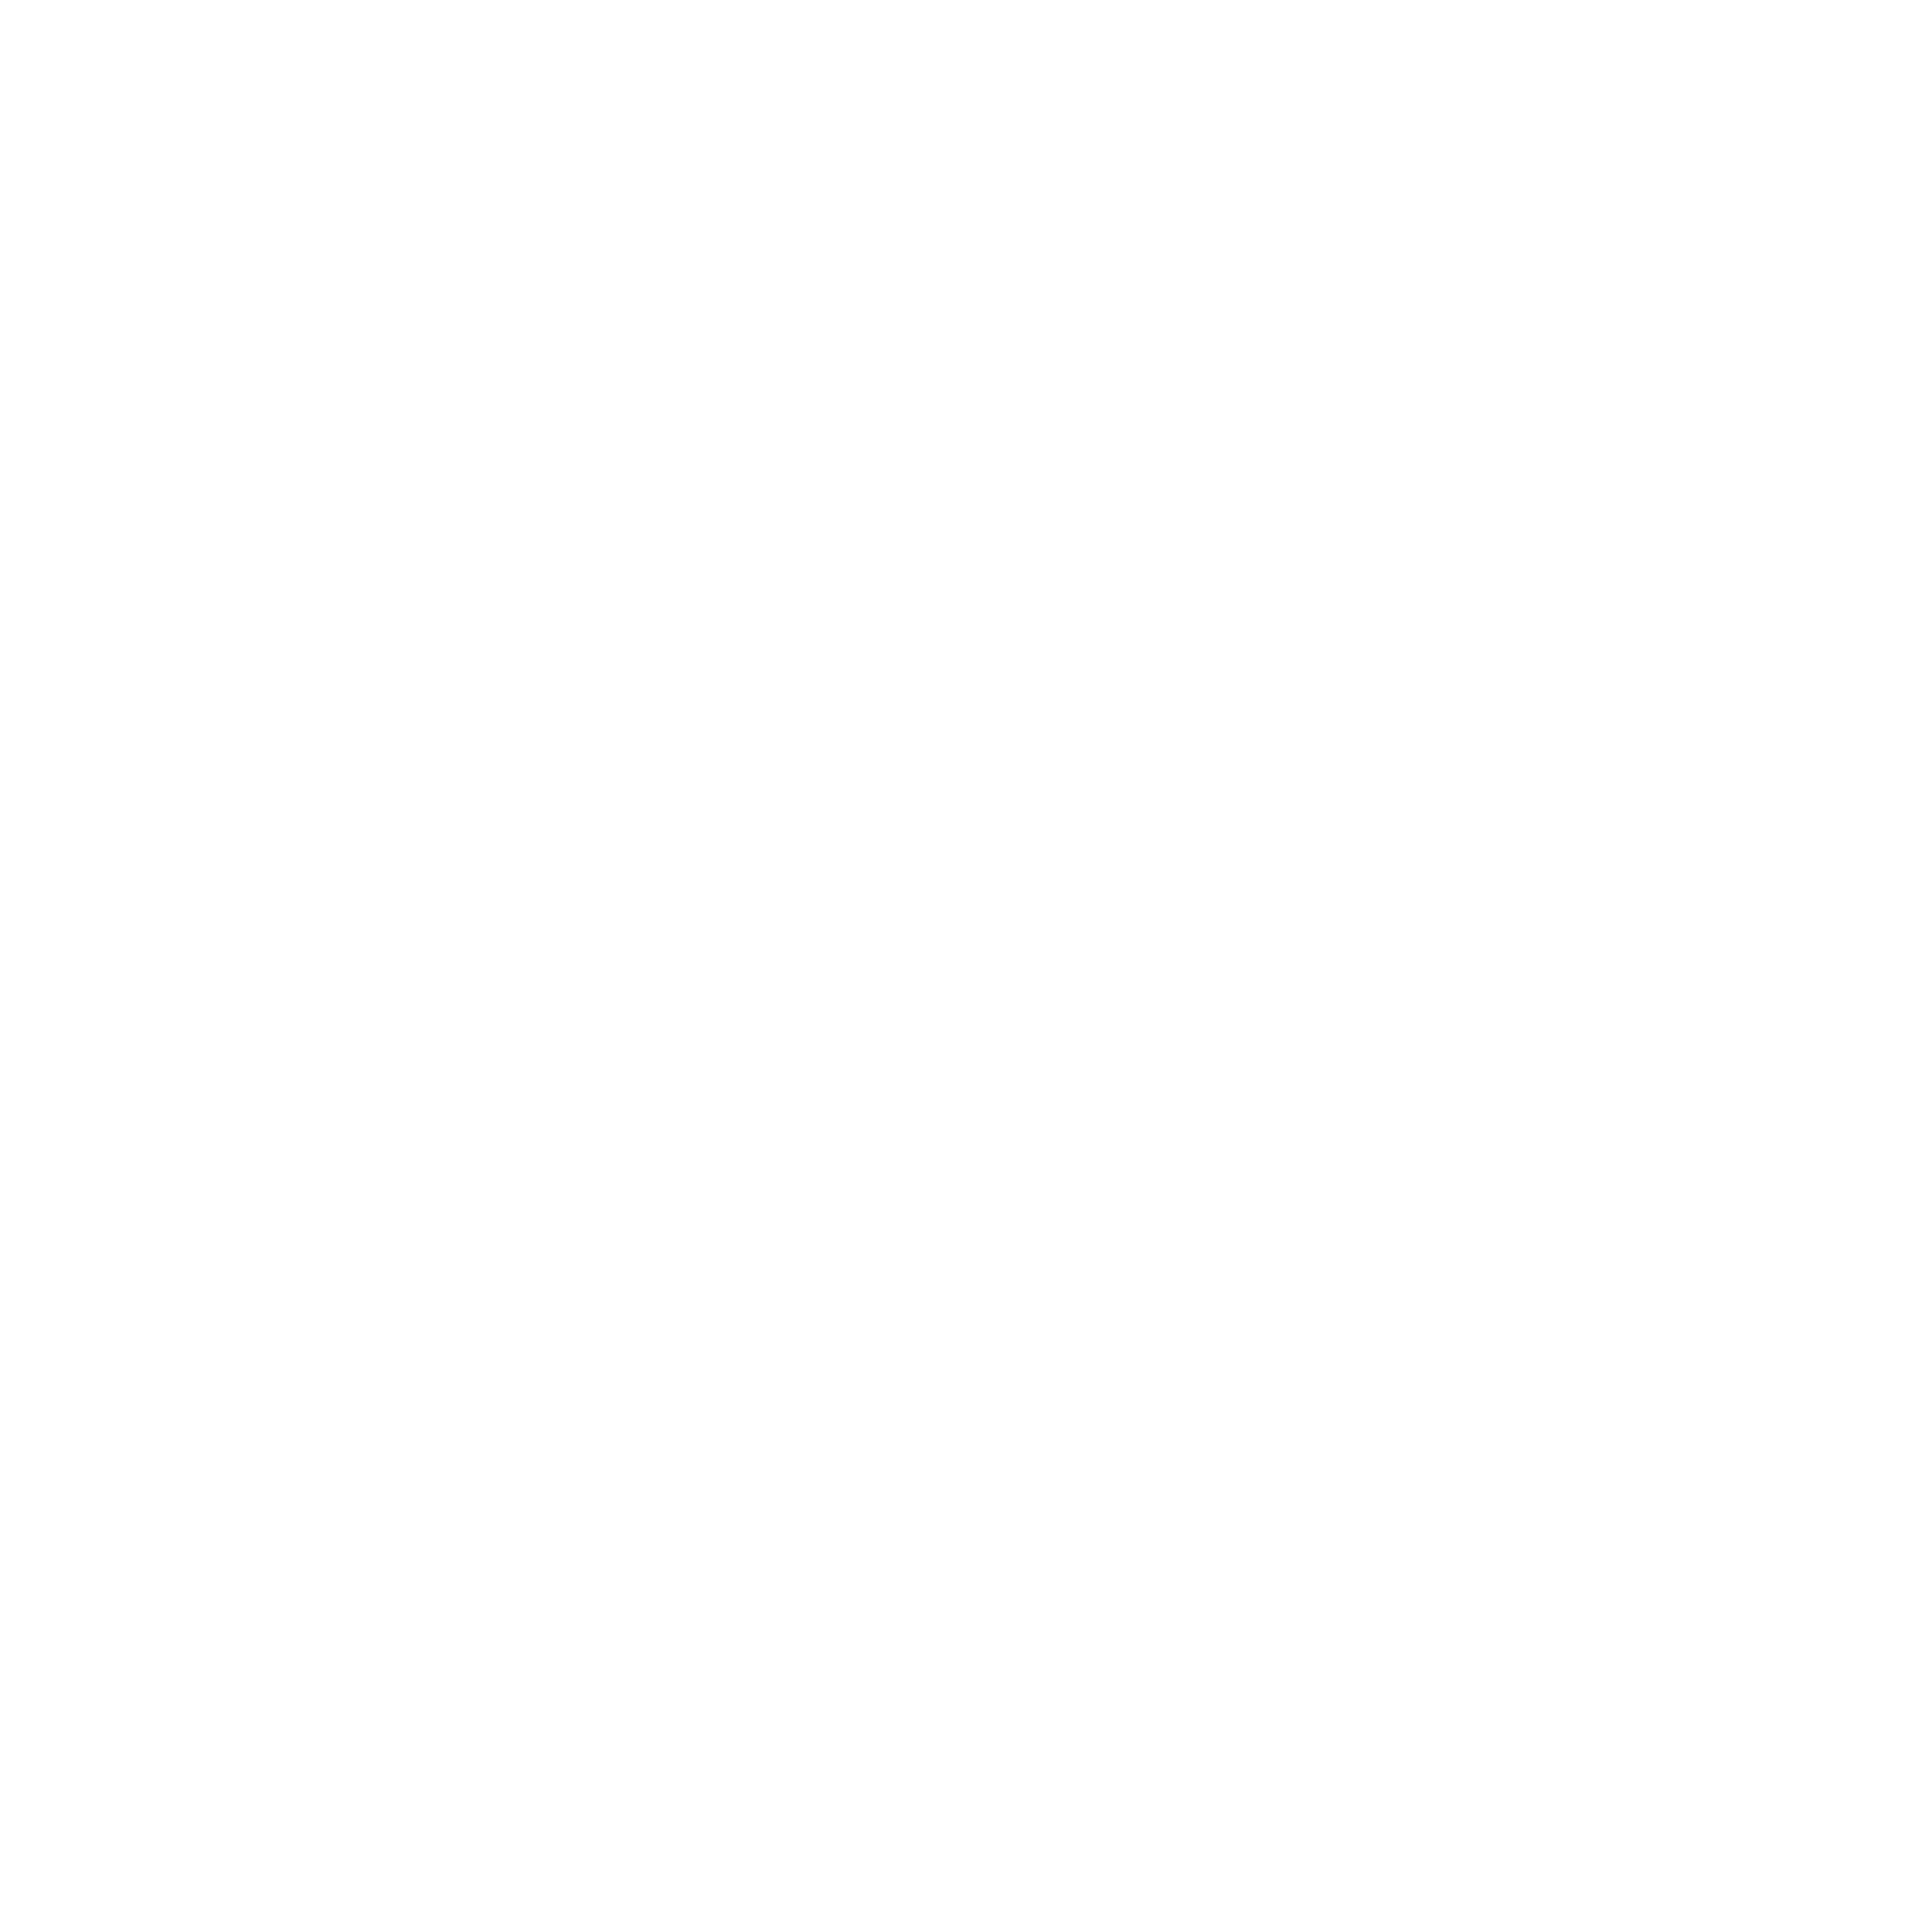 http://www.munezstudio.com/domain-web-hosting/